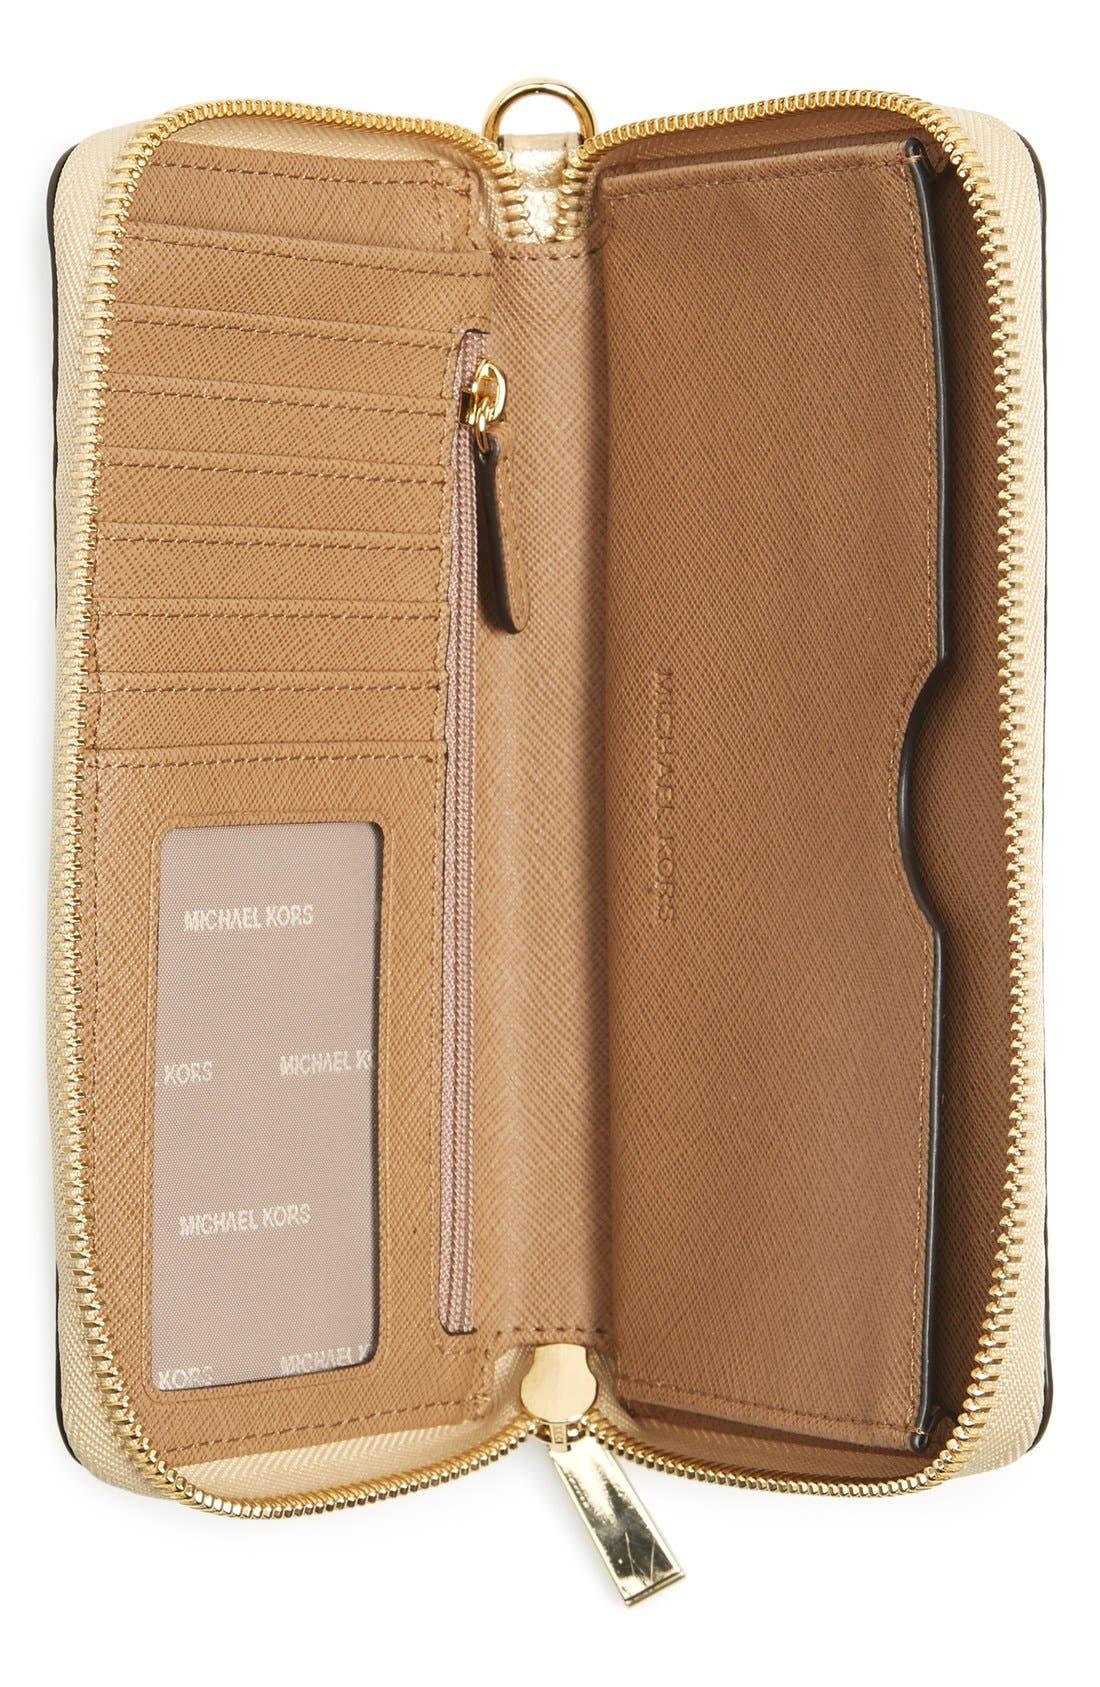 Mercer Large Leather Wristlet,                             Alternate thumbnail 30, color,